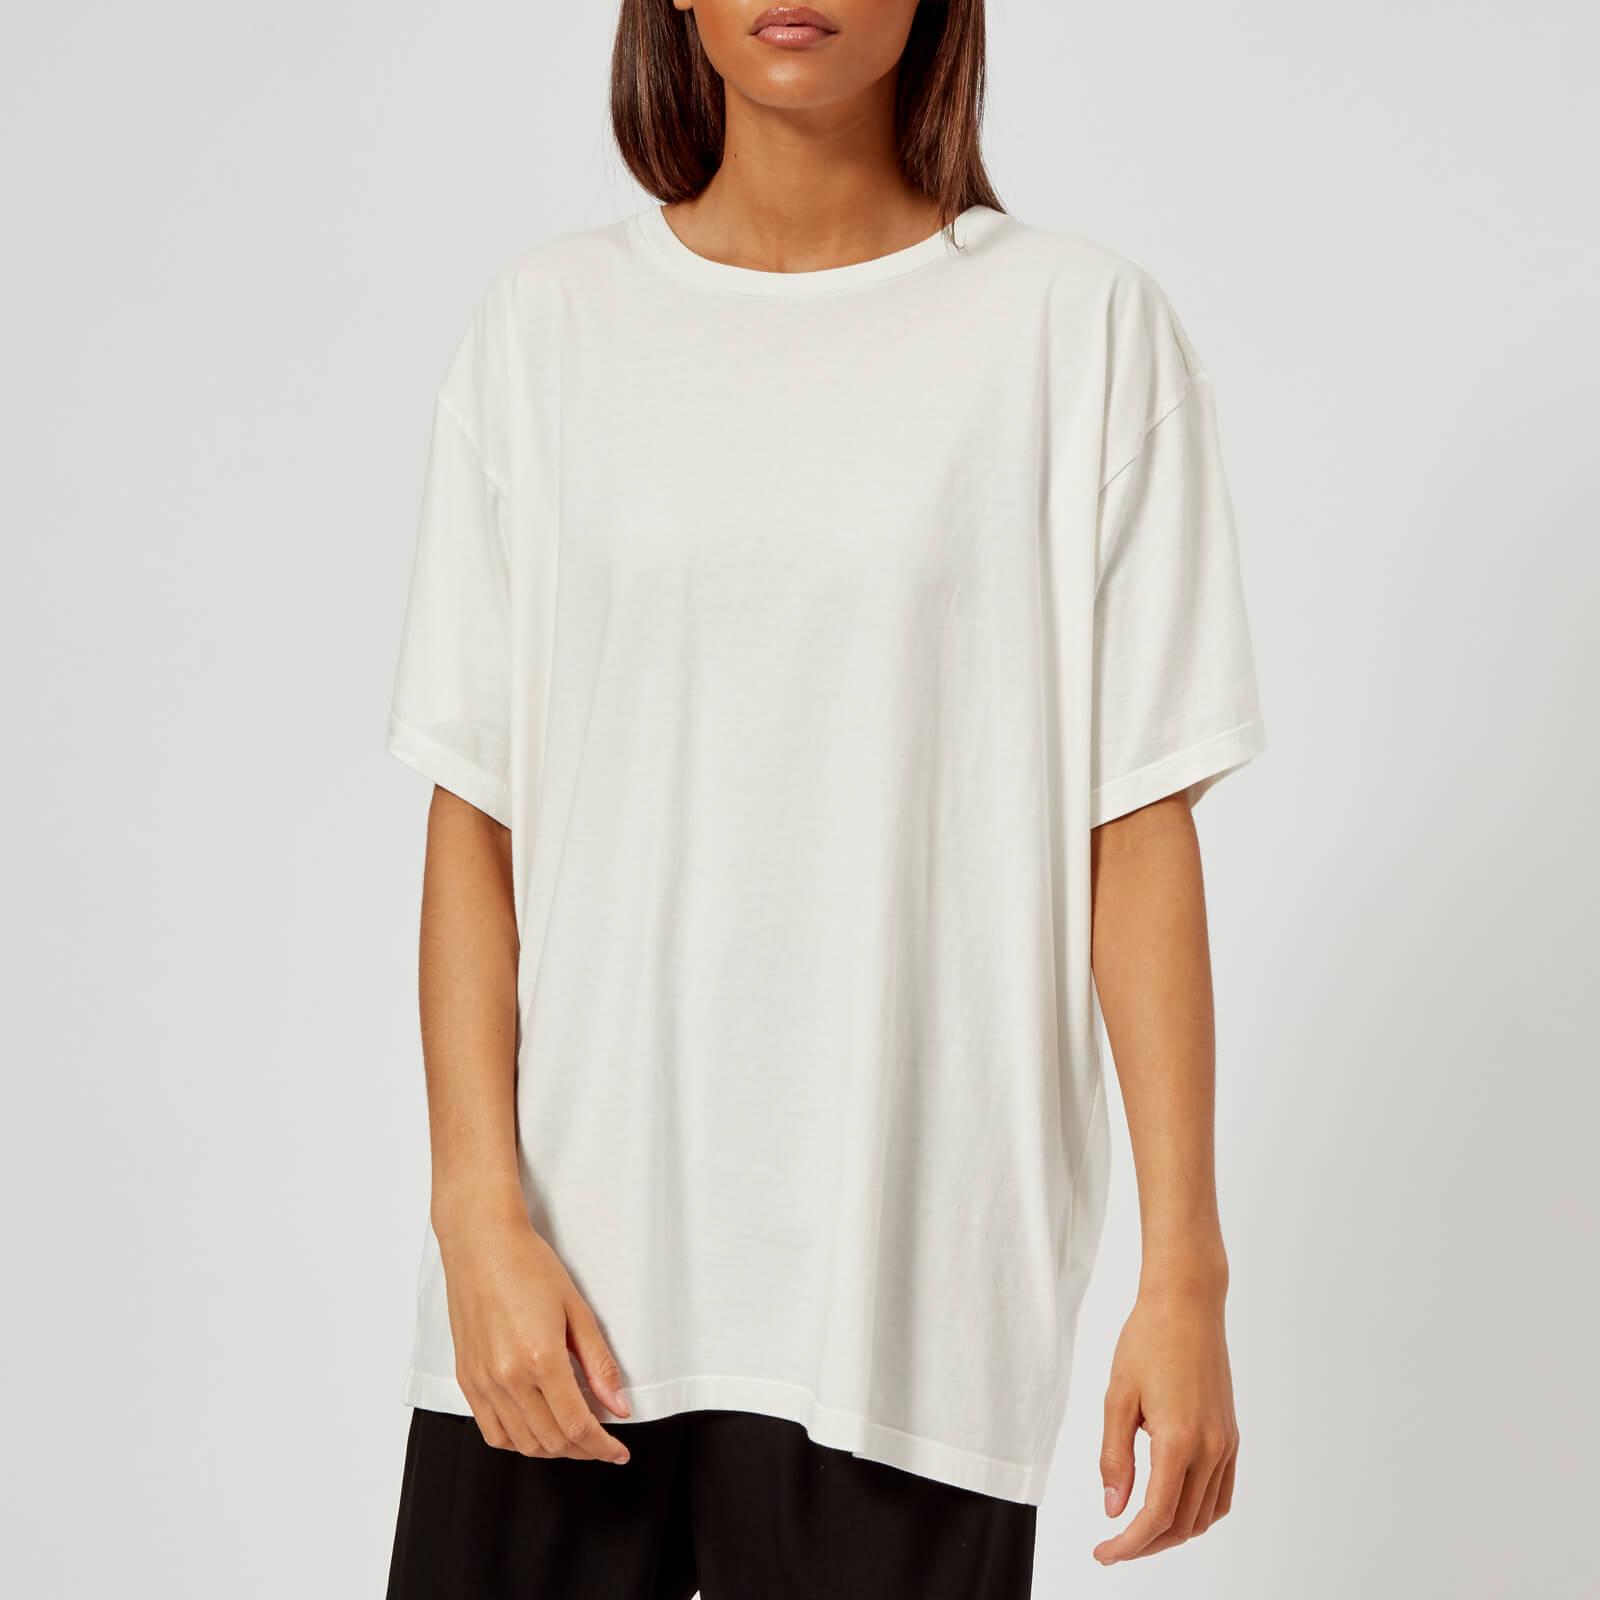 best service 0a85a 3f25f MM6 Maison Margiela Women's No 6 T-Shirt - White